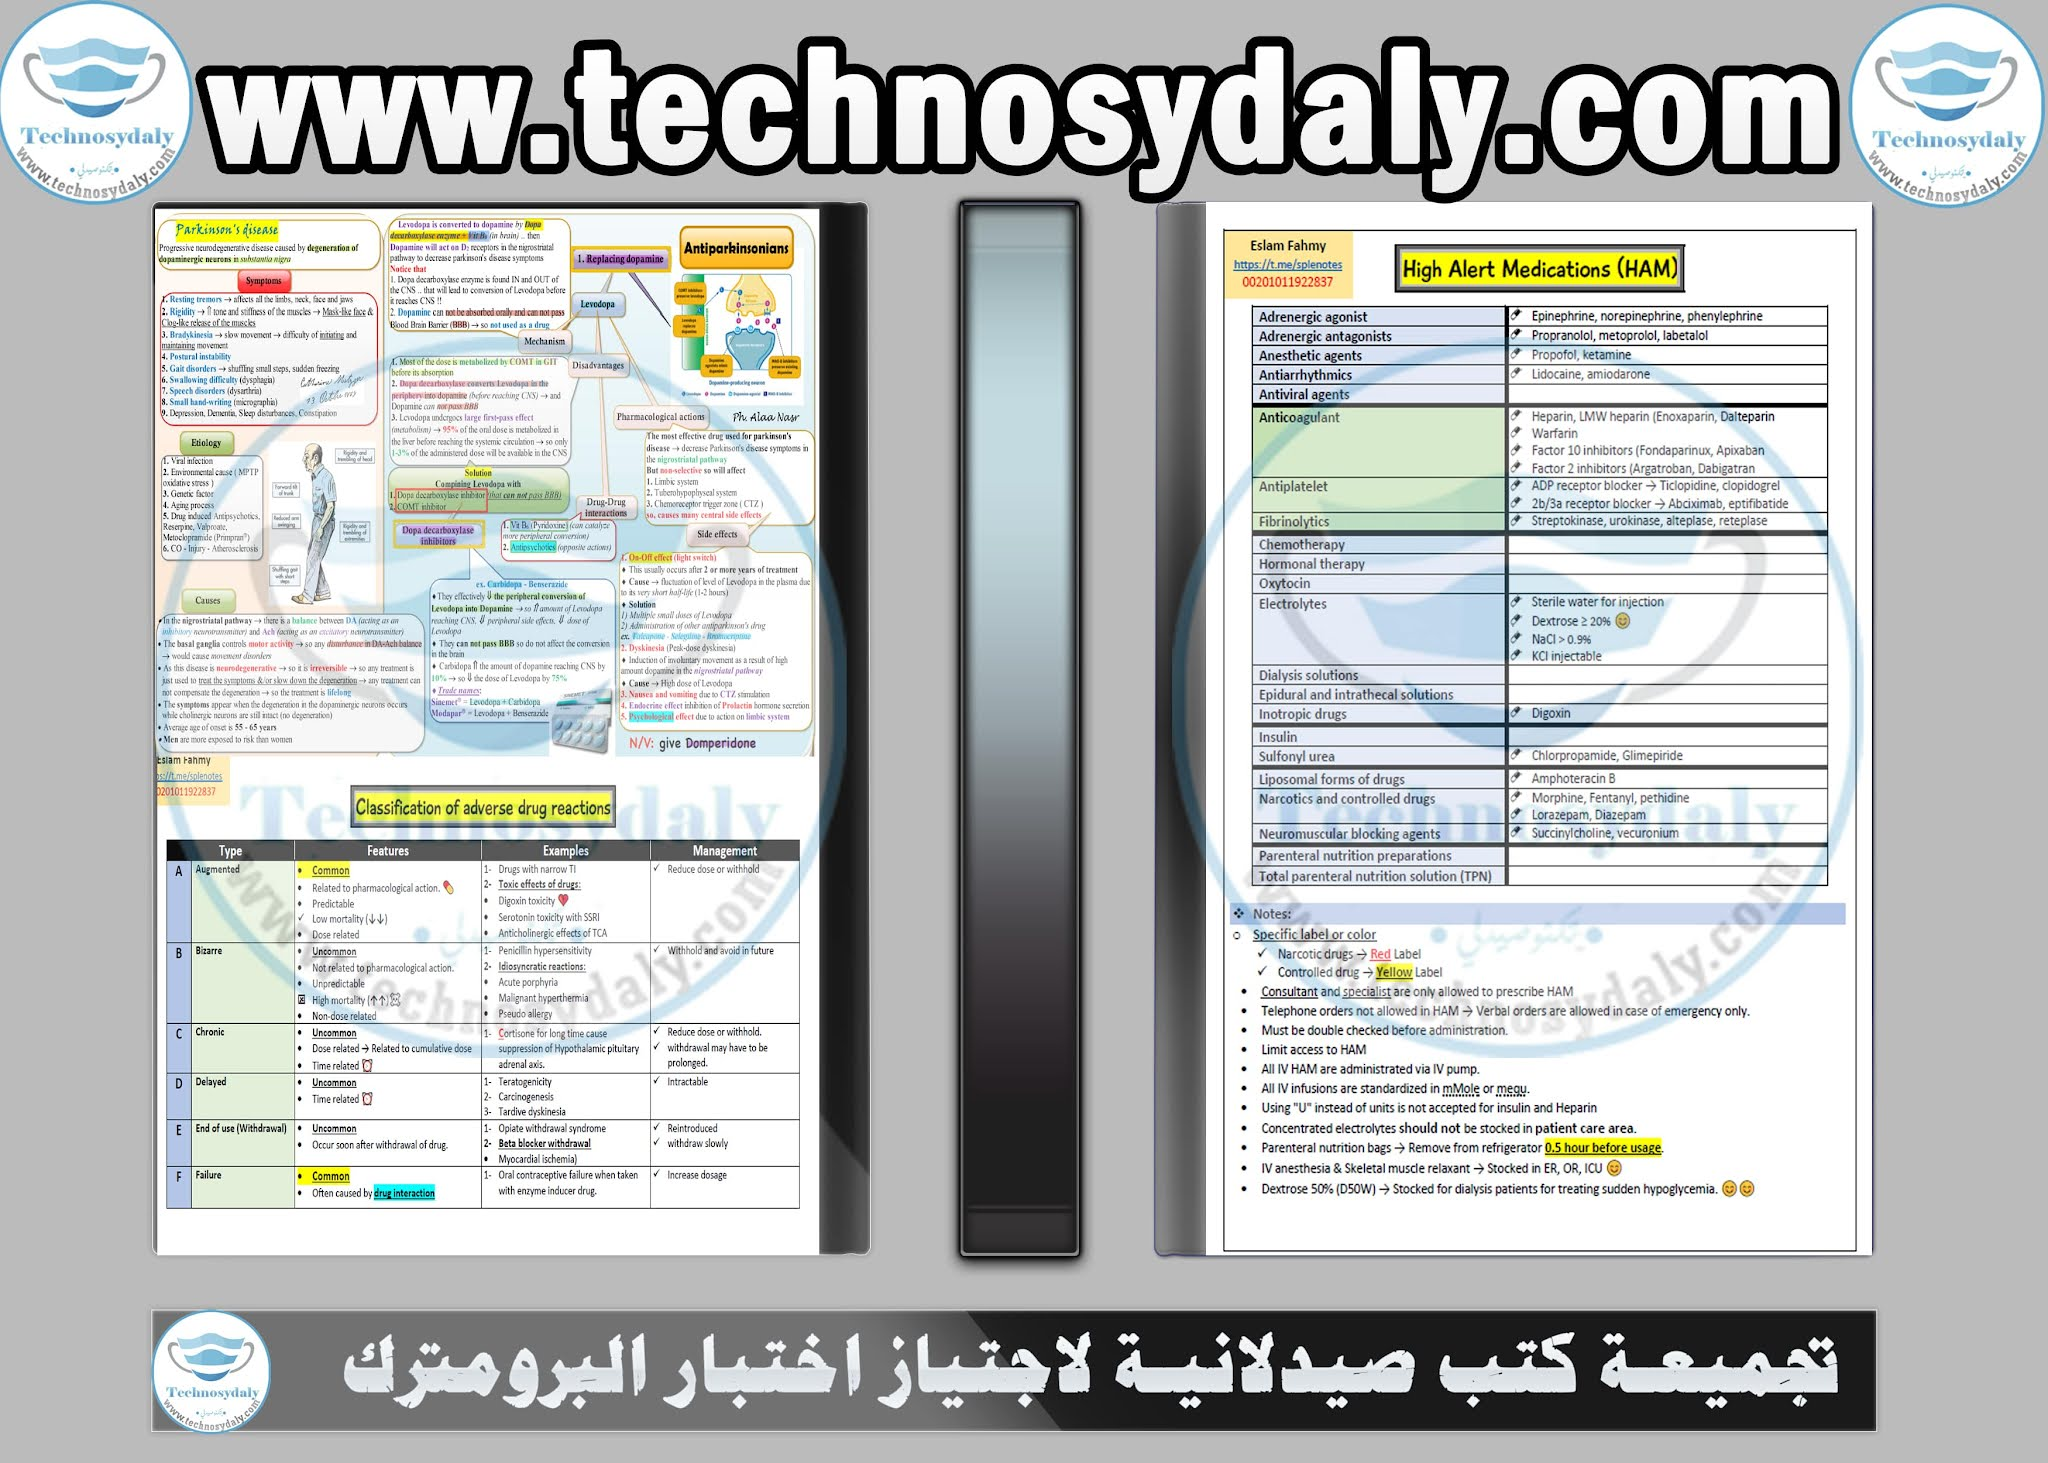 تجميعة كتب صيدلانية لاجتياز اختبار البرومترك A collection of books PDF to pass the Prometric Exam